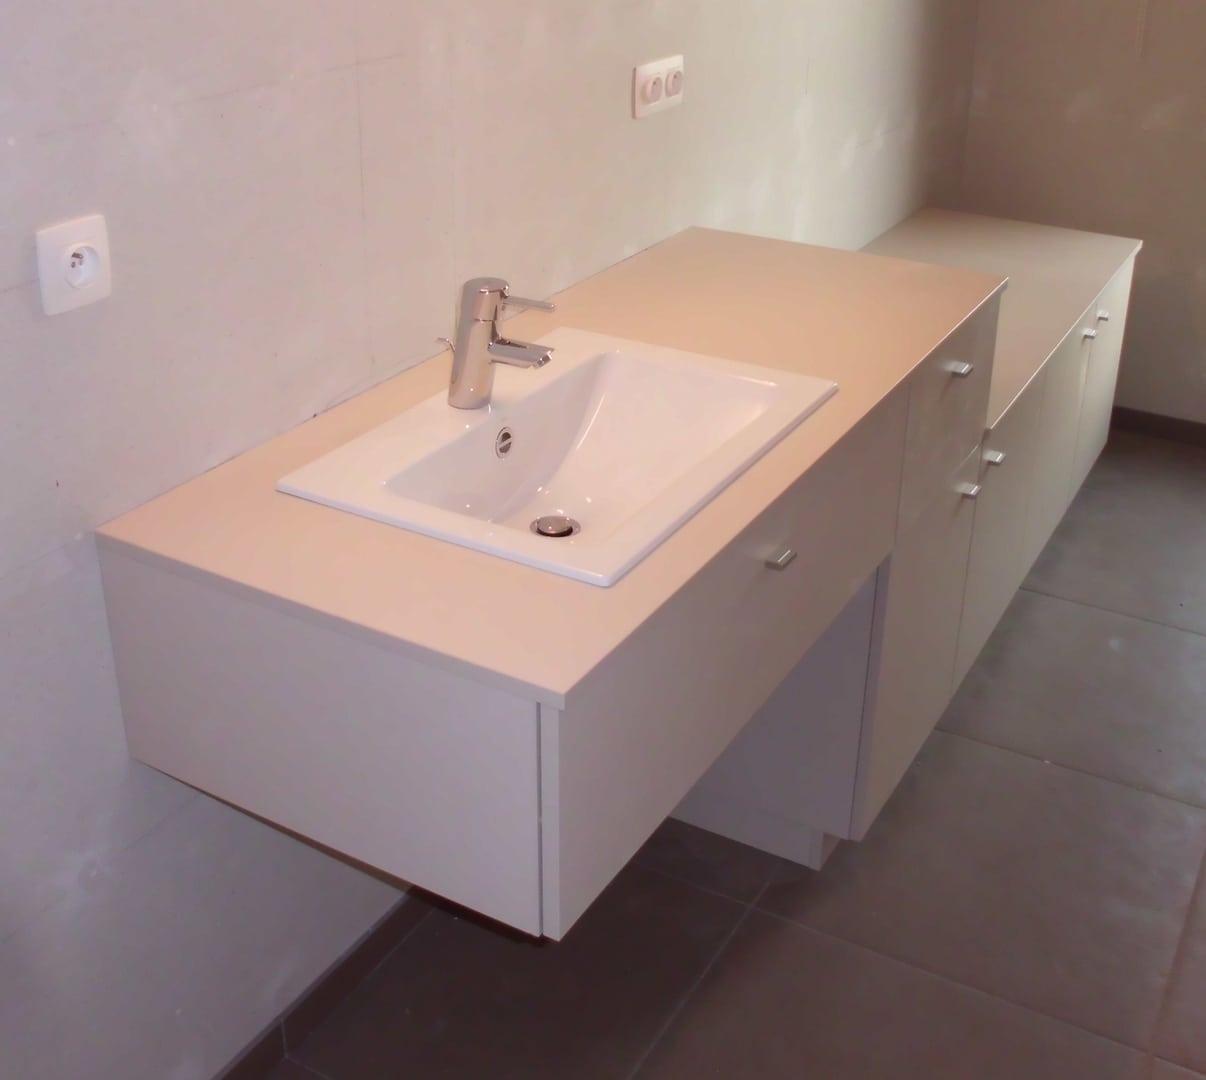 301 moved permanently for Zelf maken badkamermeubel